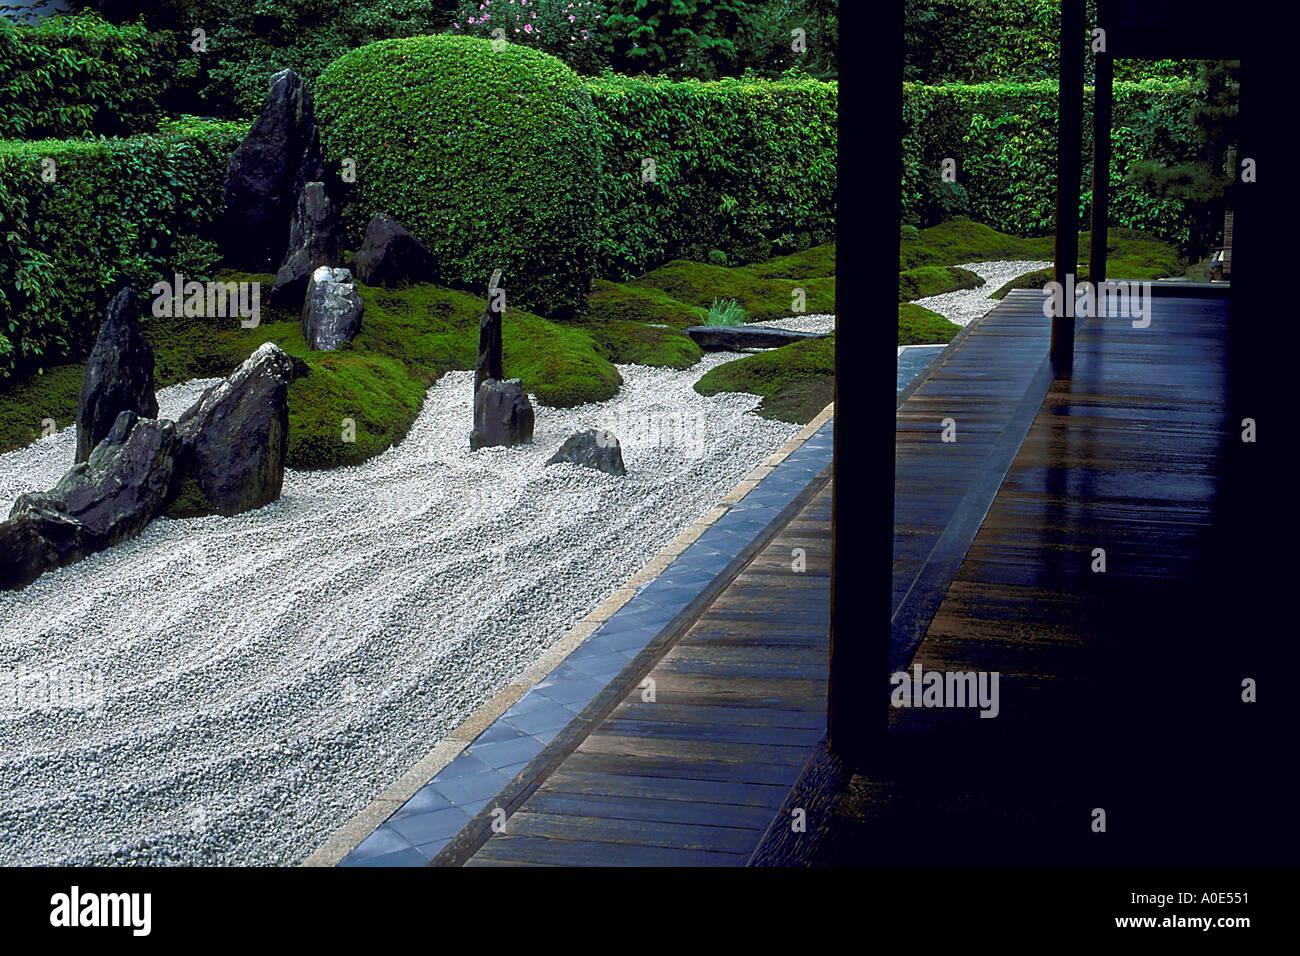 Zuiho in rock garden in Kyoto Japan - Stock Image